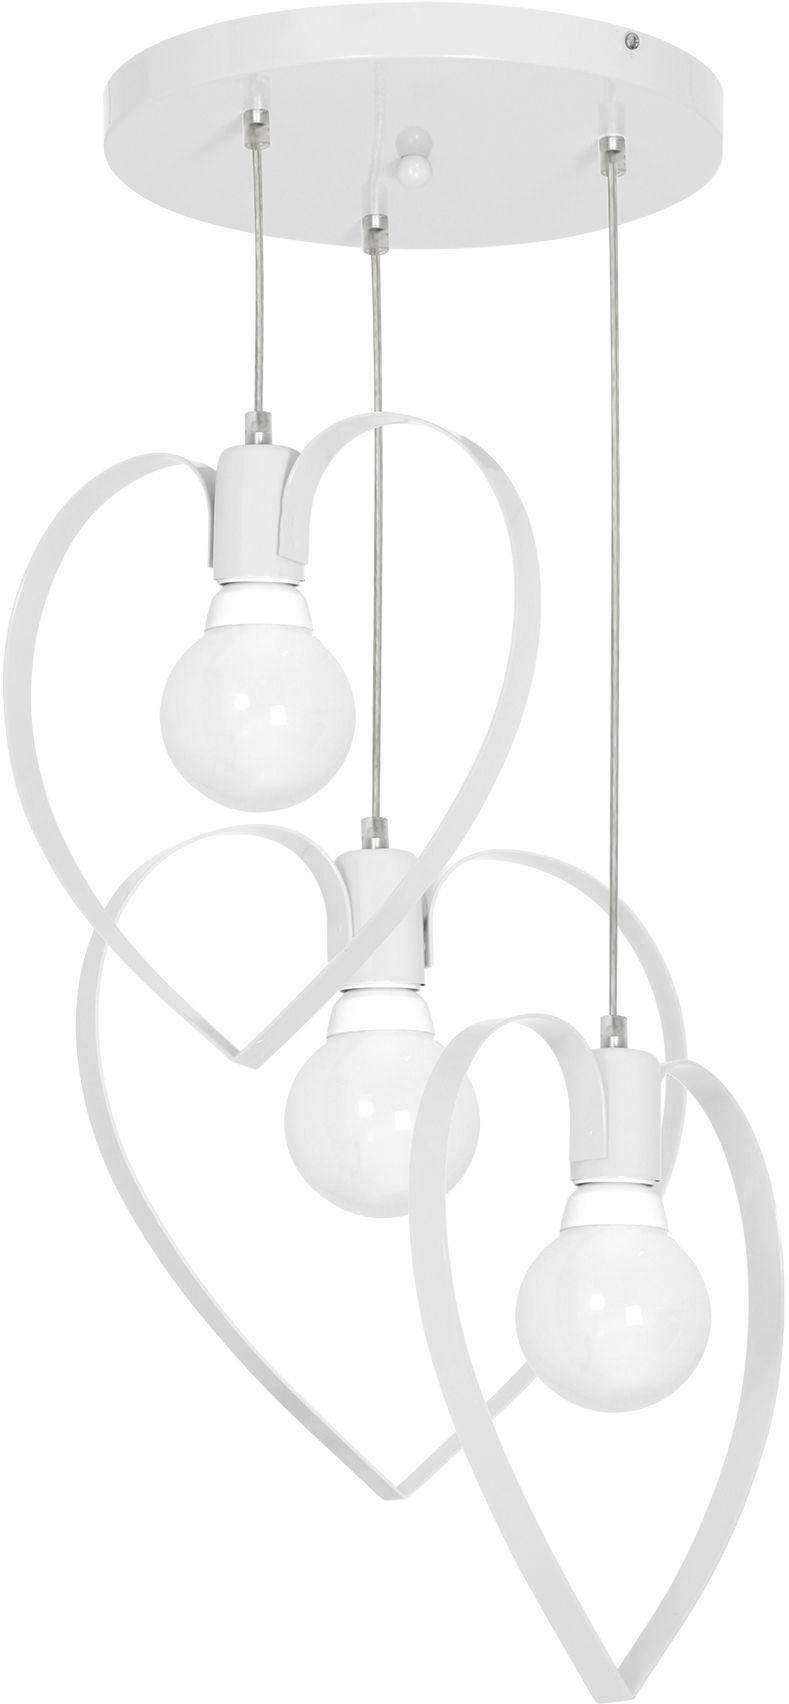 Milagro AMORE WHITE MLP9951 lampa wisząca romantyczny charakter metalowa biała serca 3xE27 40cm